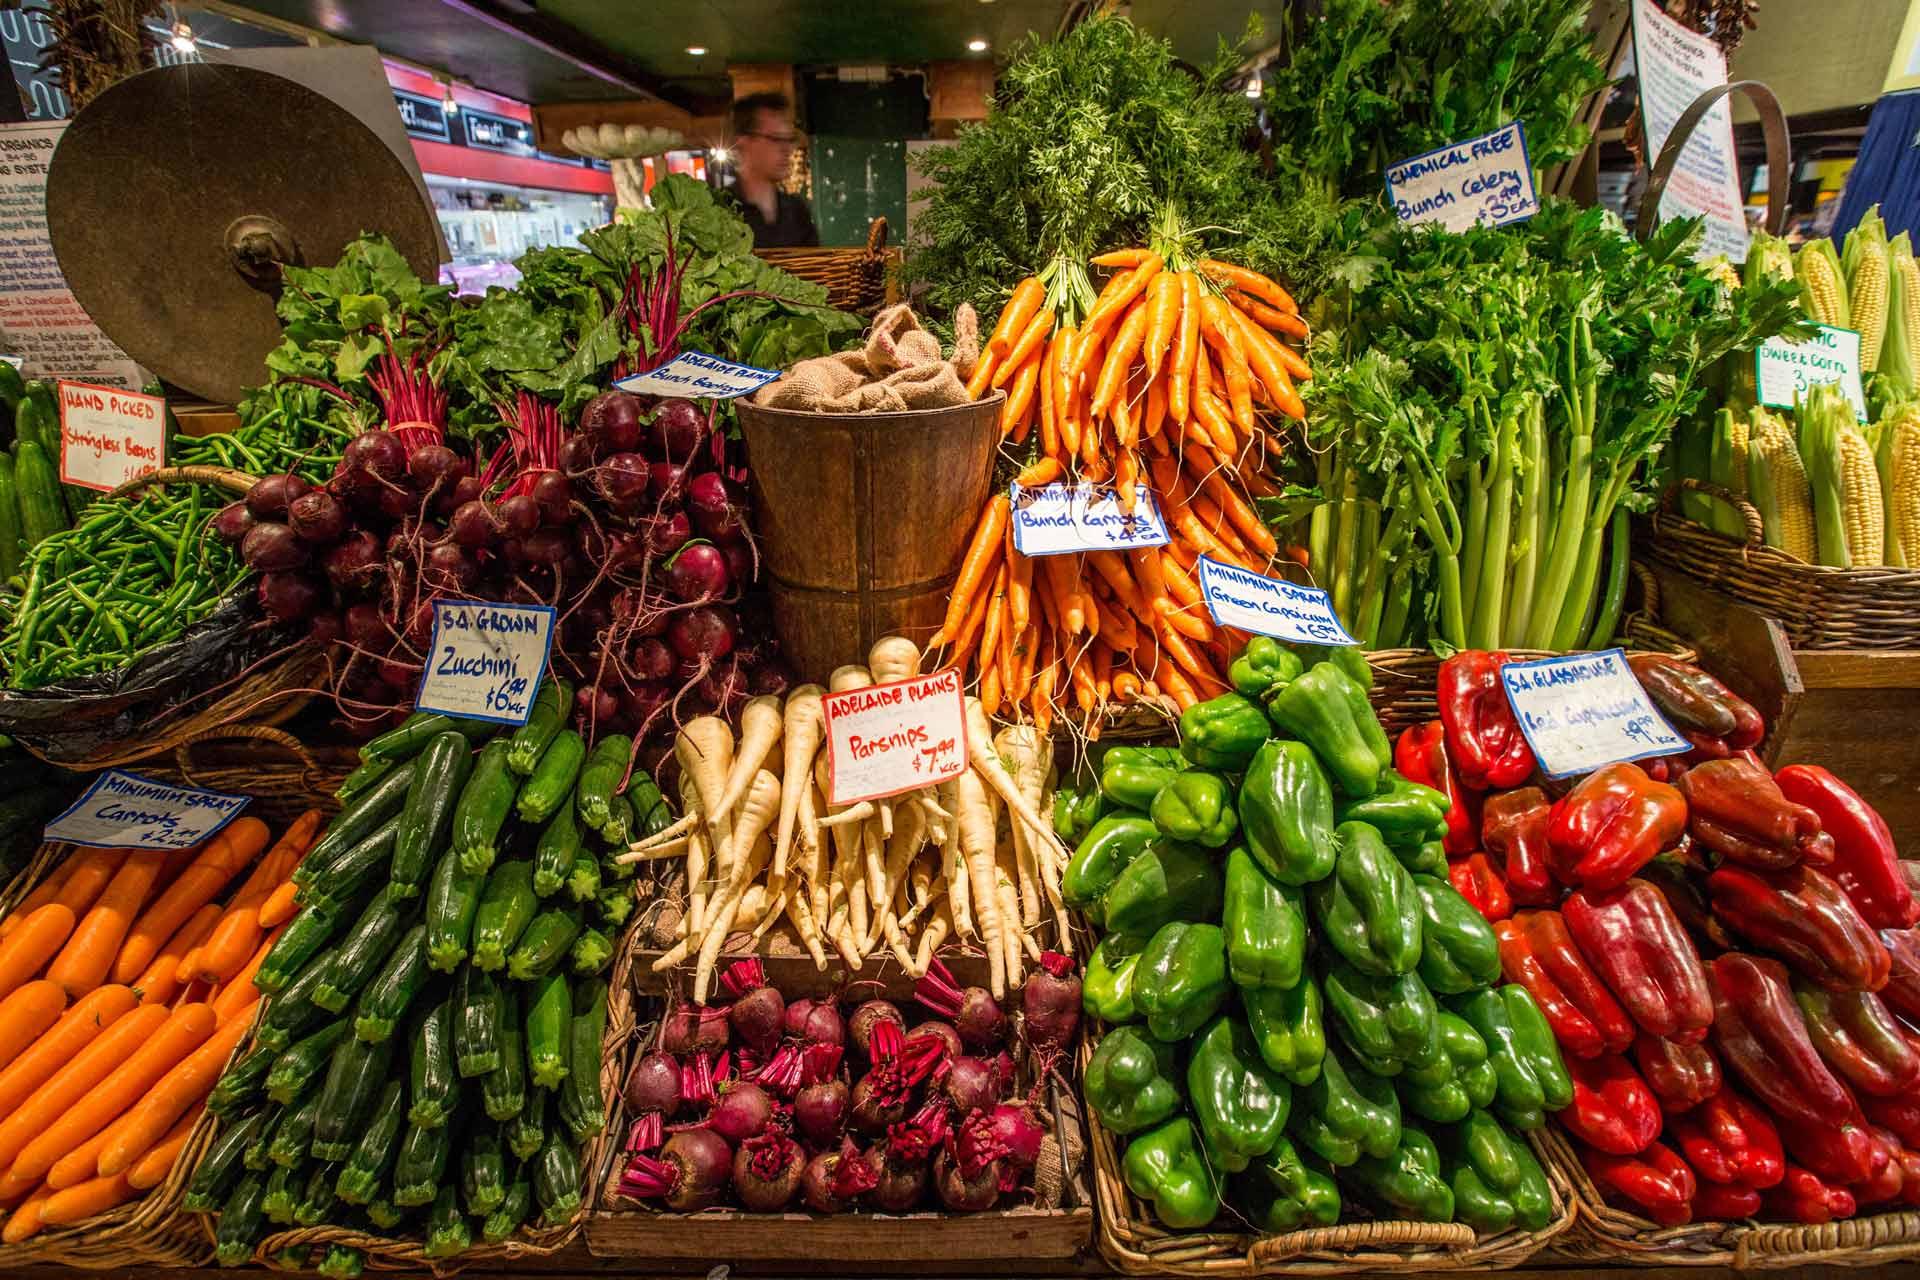 130940-Adelaide-Central-Market,-Adelaide,-SA